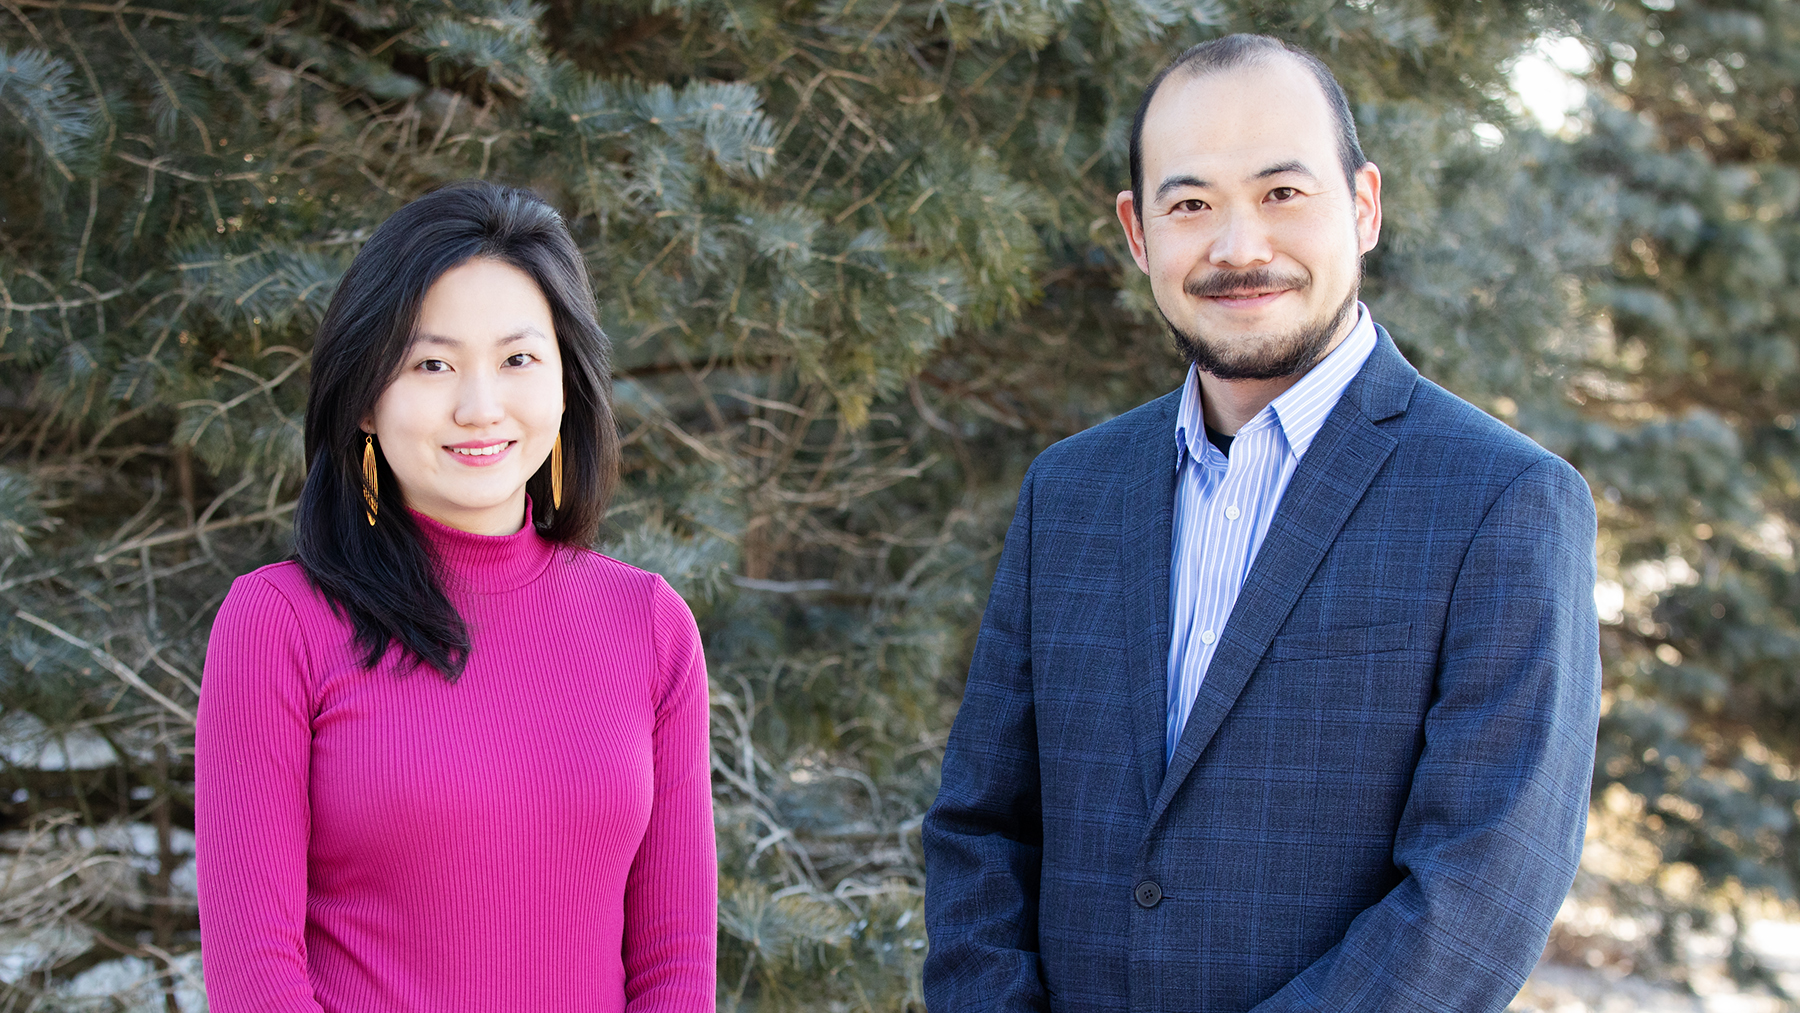 Graduate student Yee Ming Khaw and comparative biosciences professor Makoto Inoue led the study. Photo by Leslie B. Stauffer